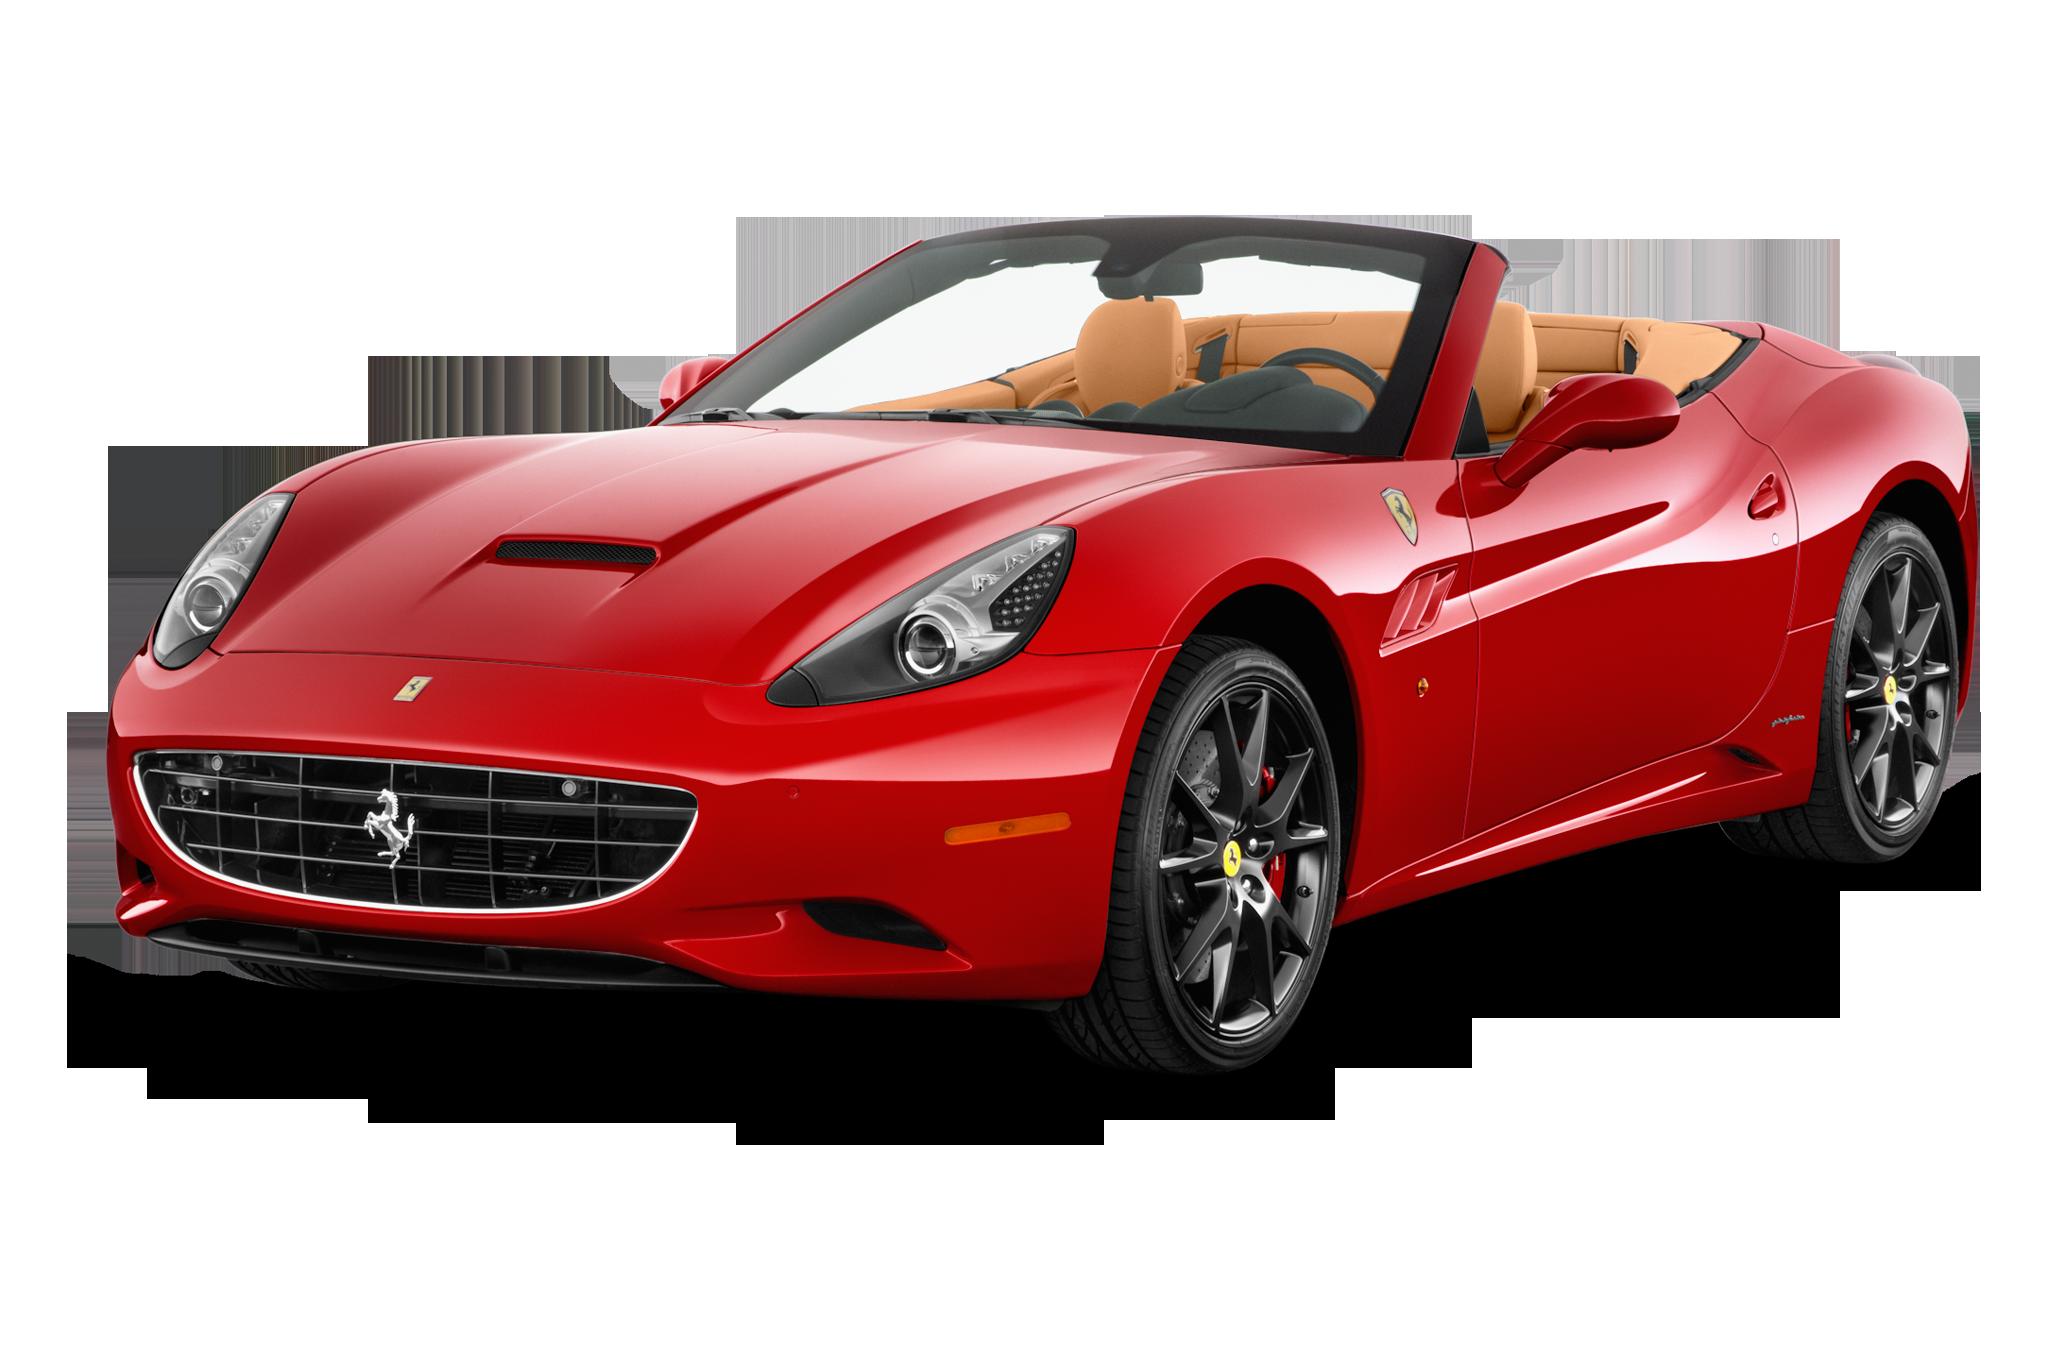 2012-ferrari-california-convertible-angular-front